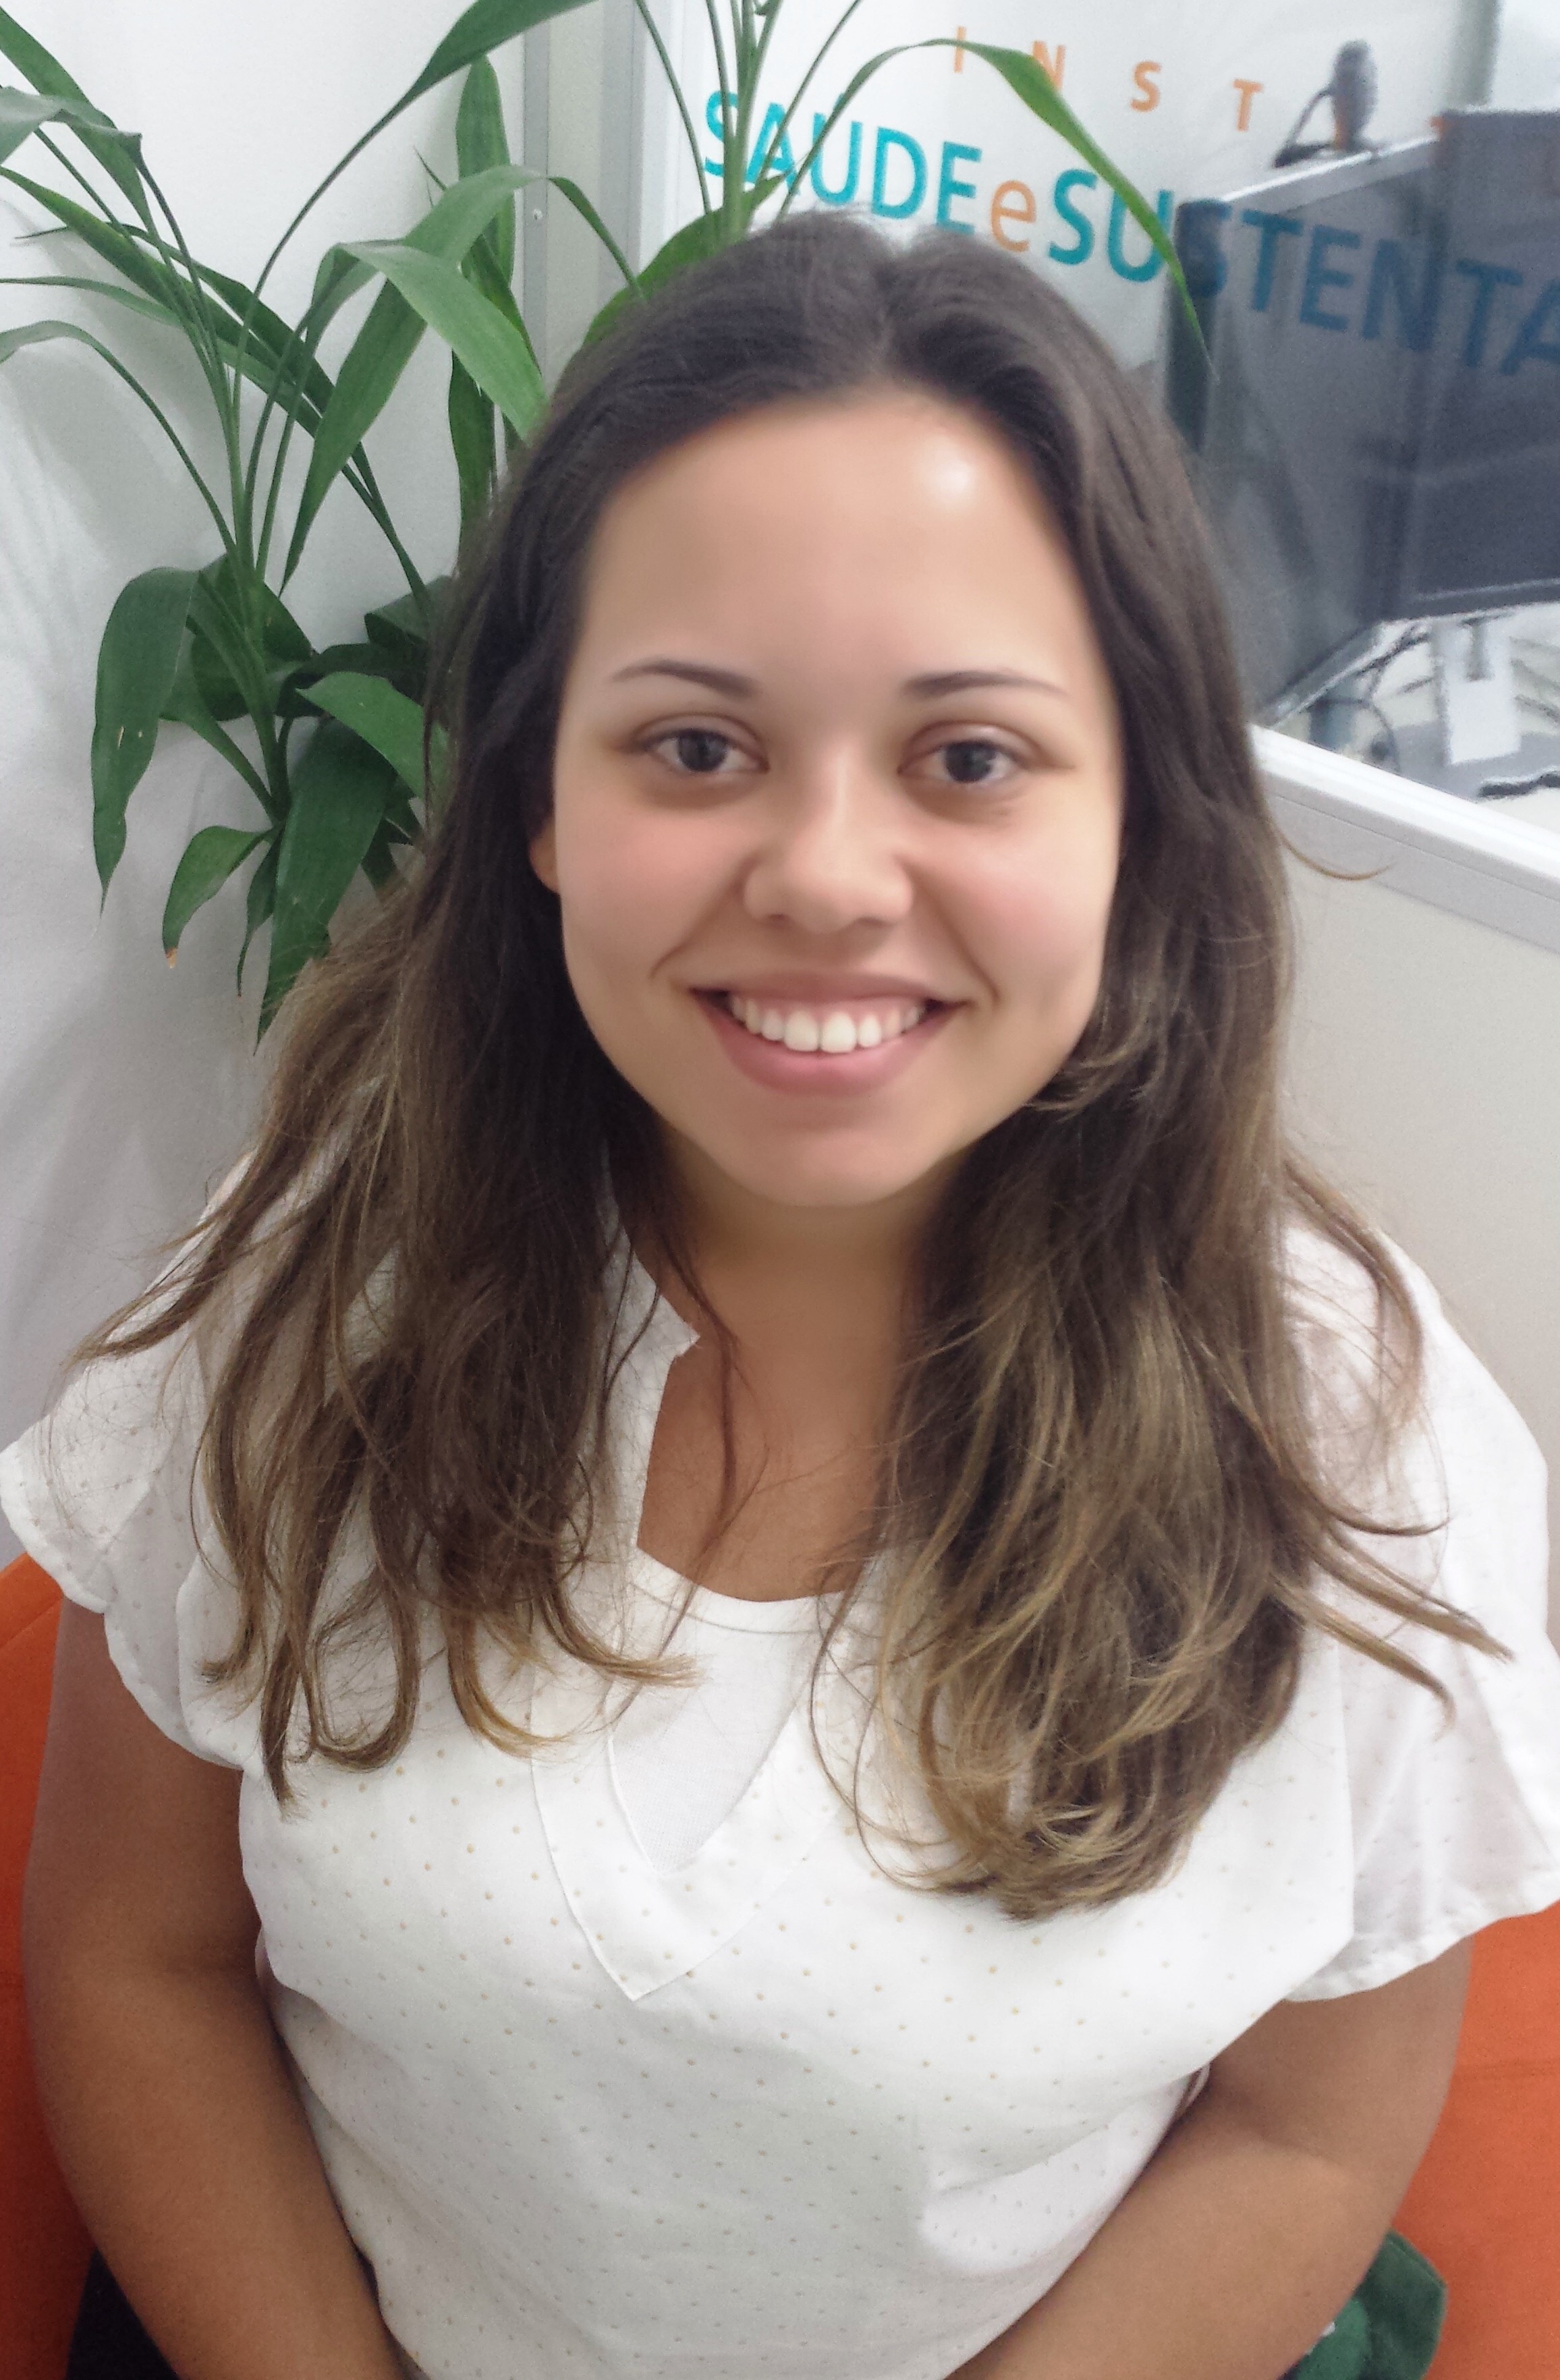 Carolina Pires